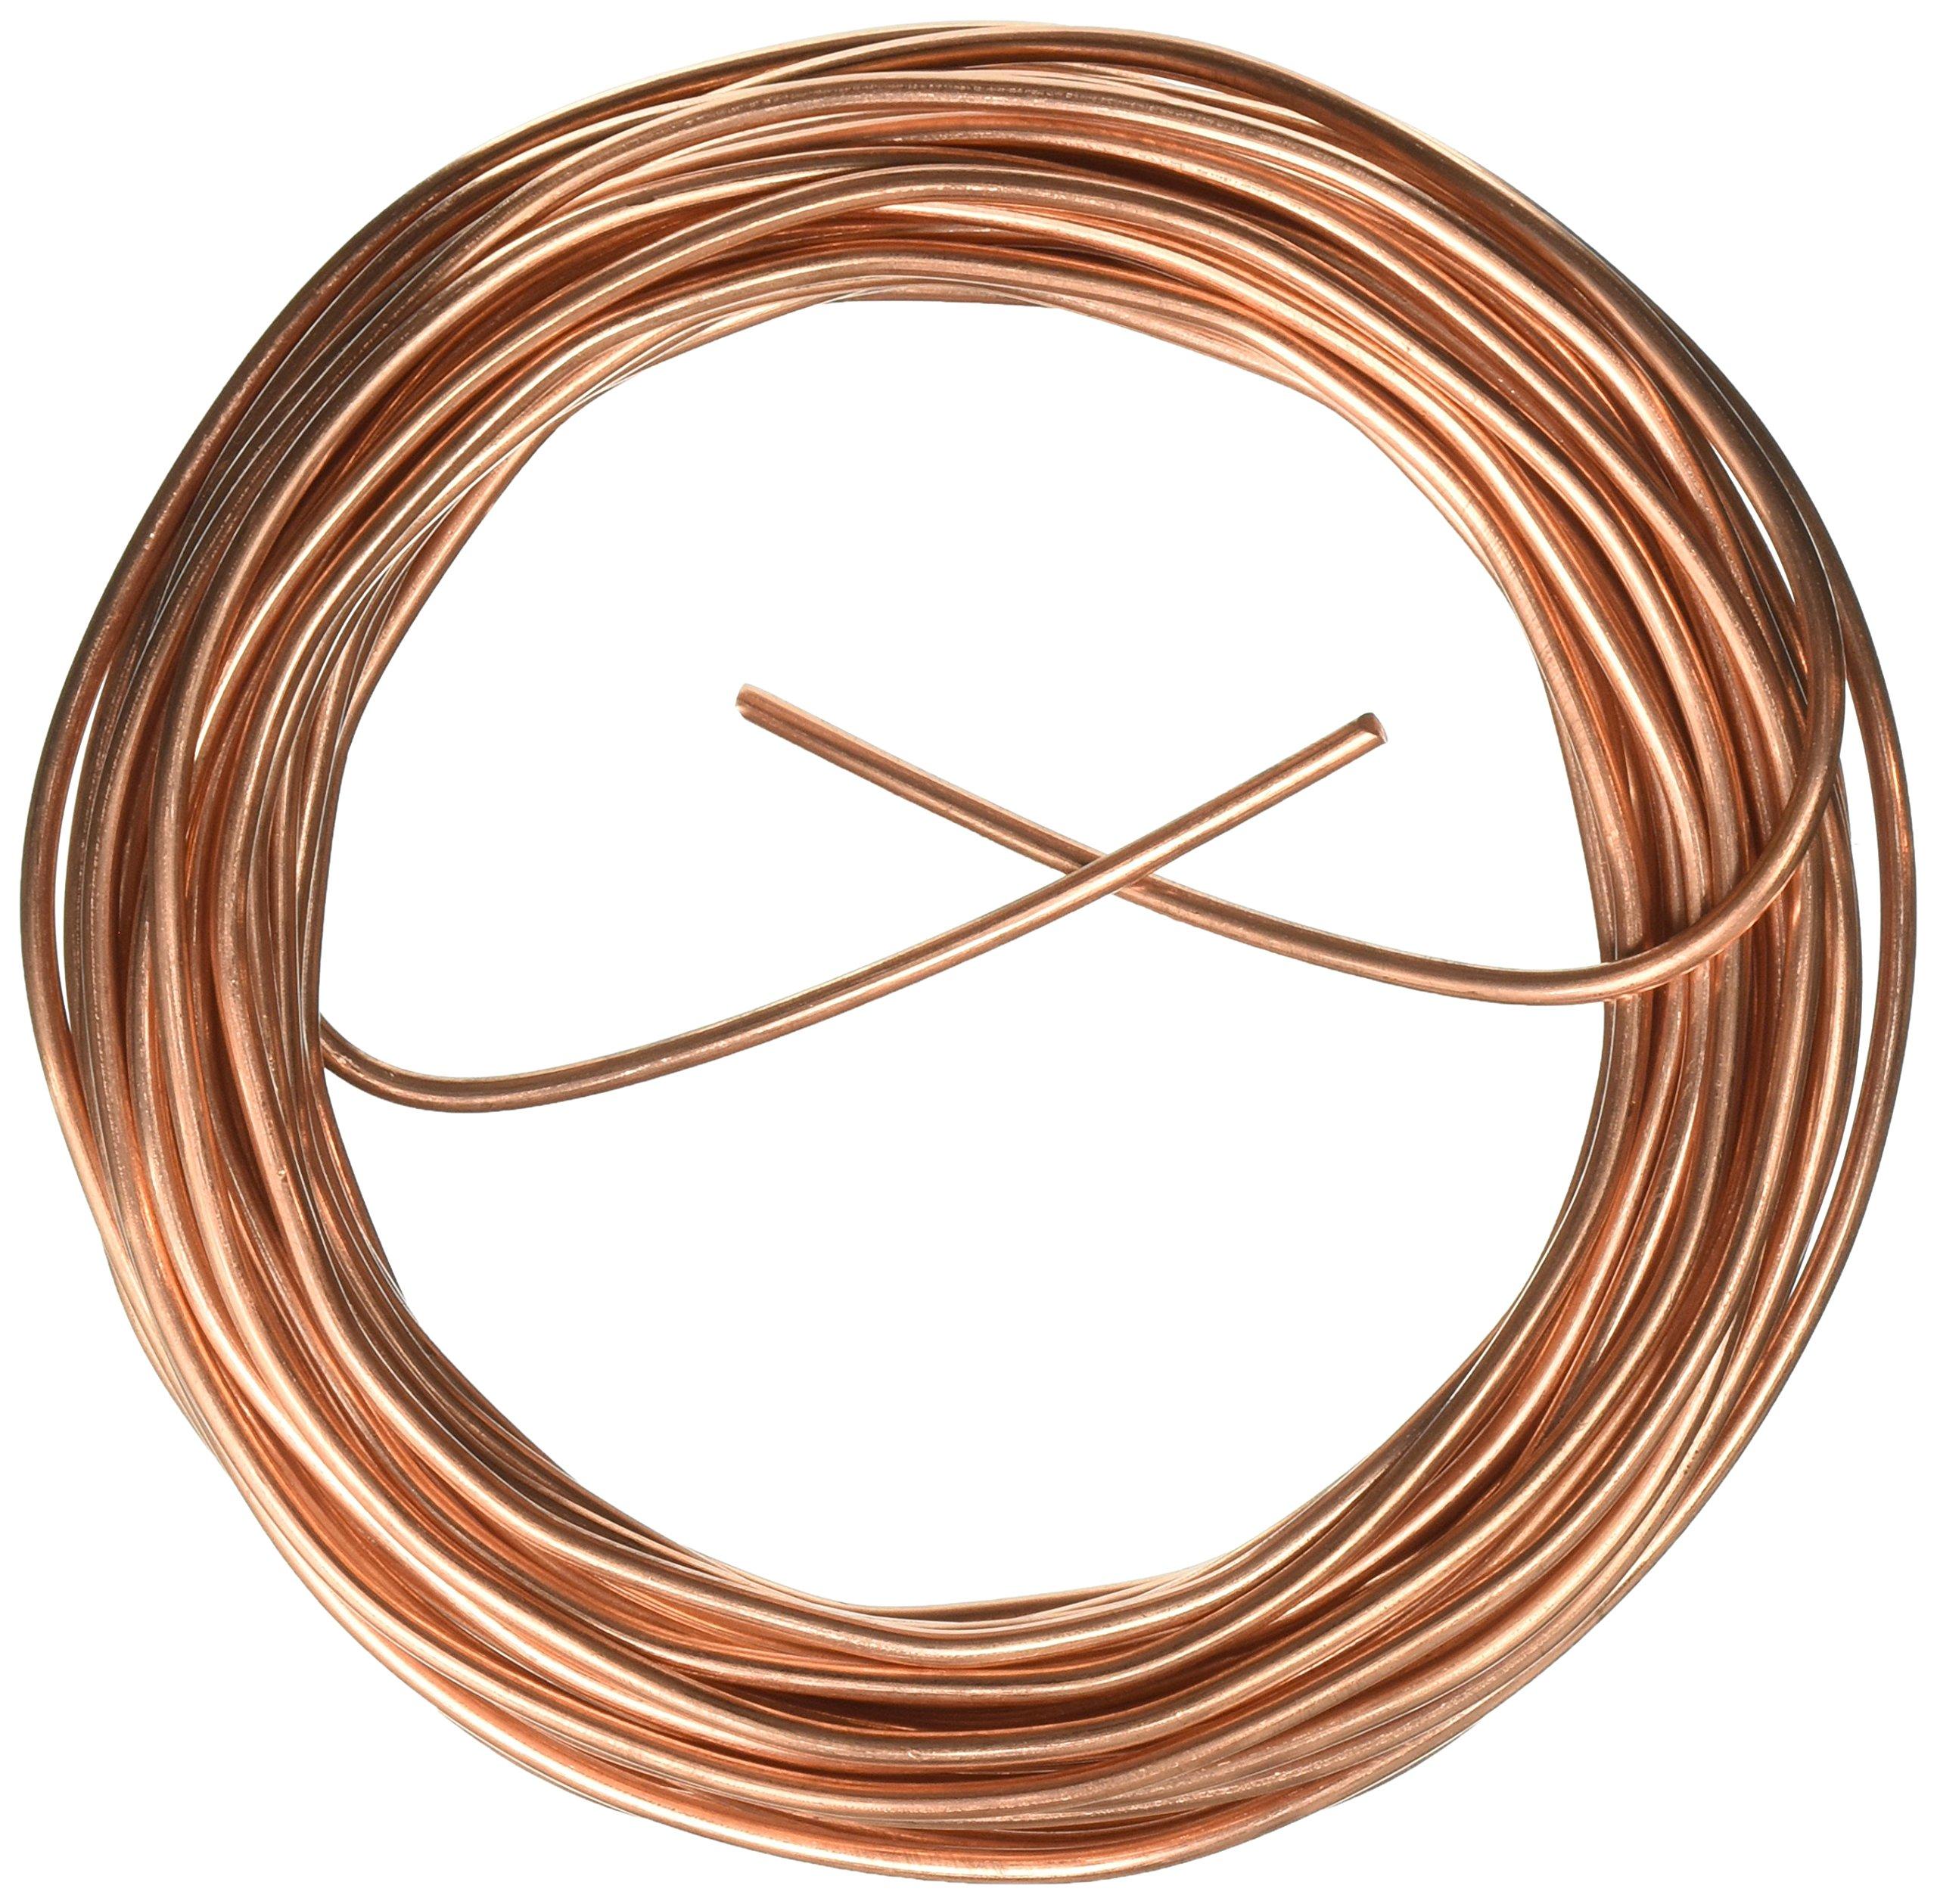 Cerrowire 050-2000B 50-Feet 8 Gauge Bare Solid Copper Wire